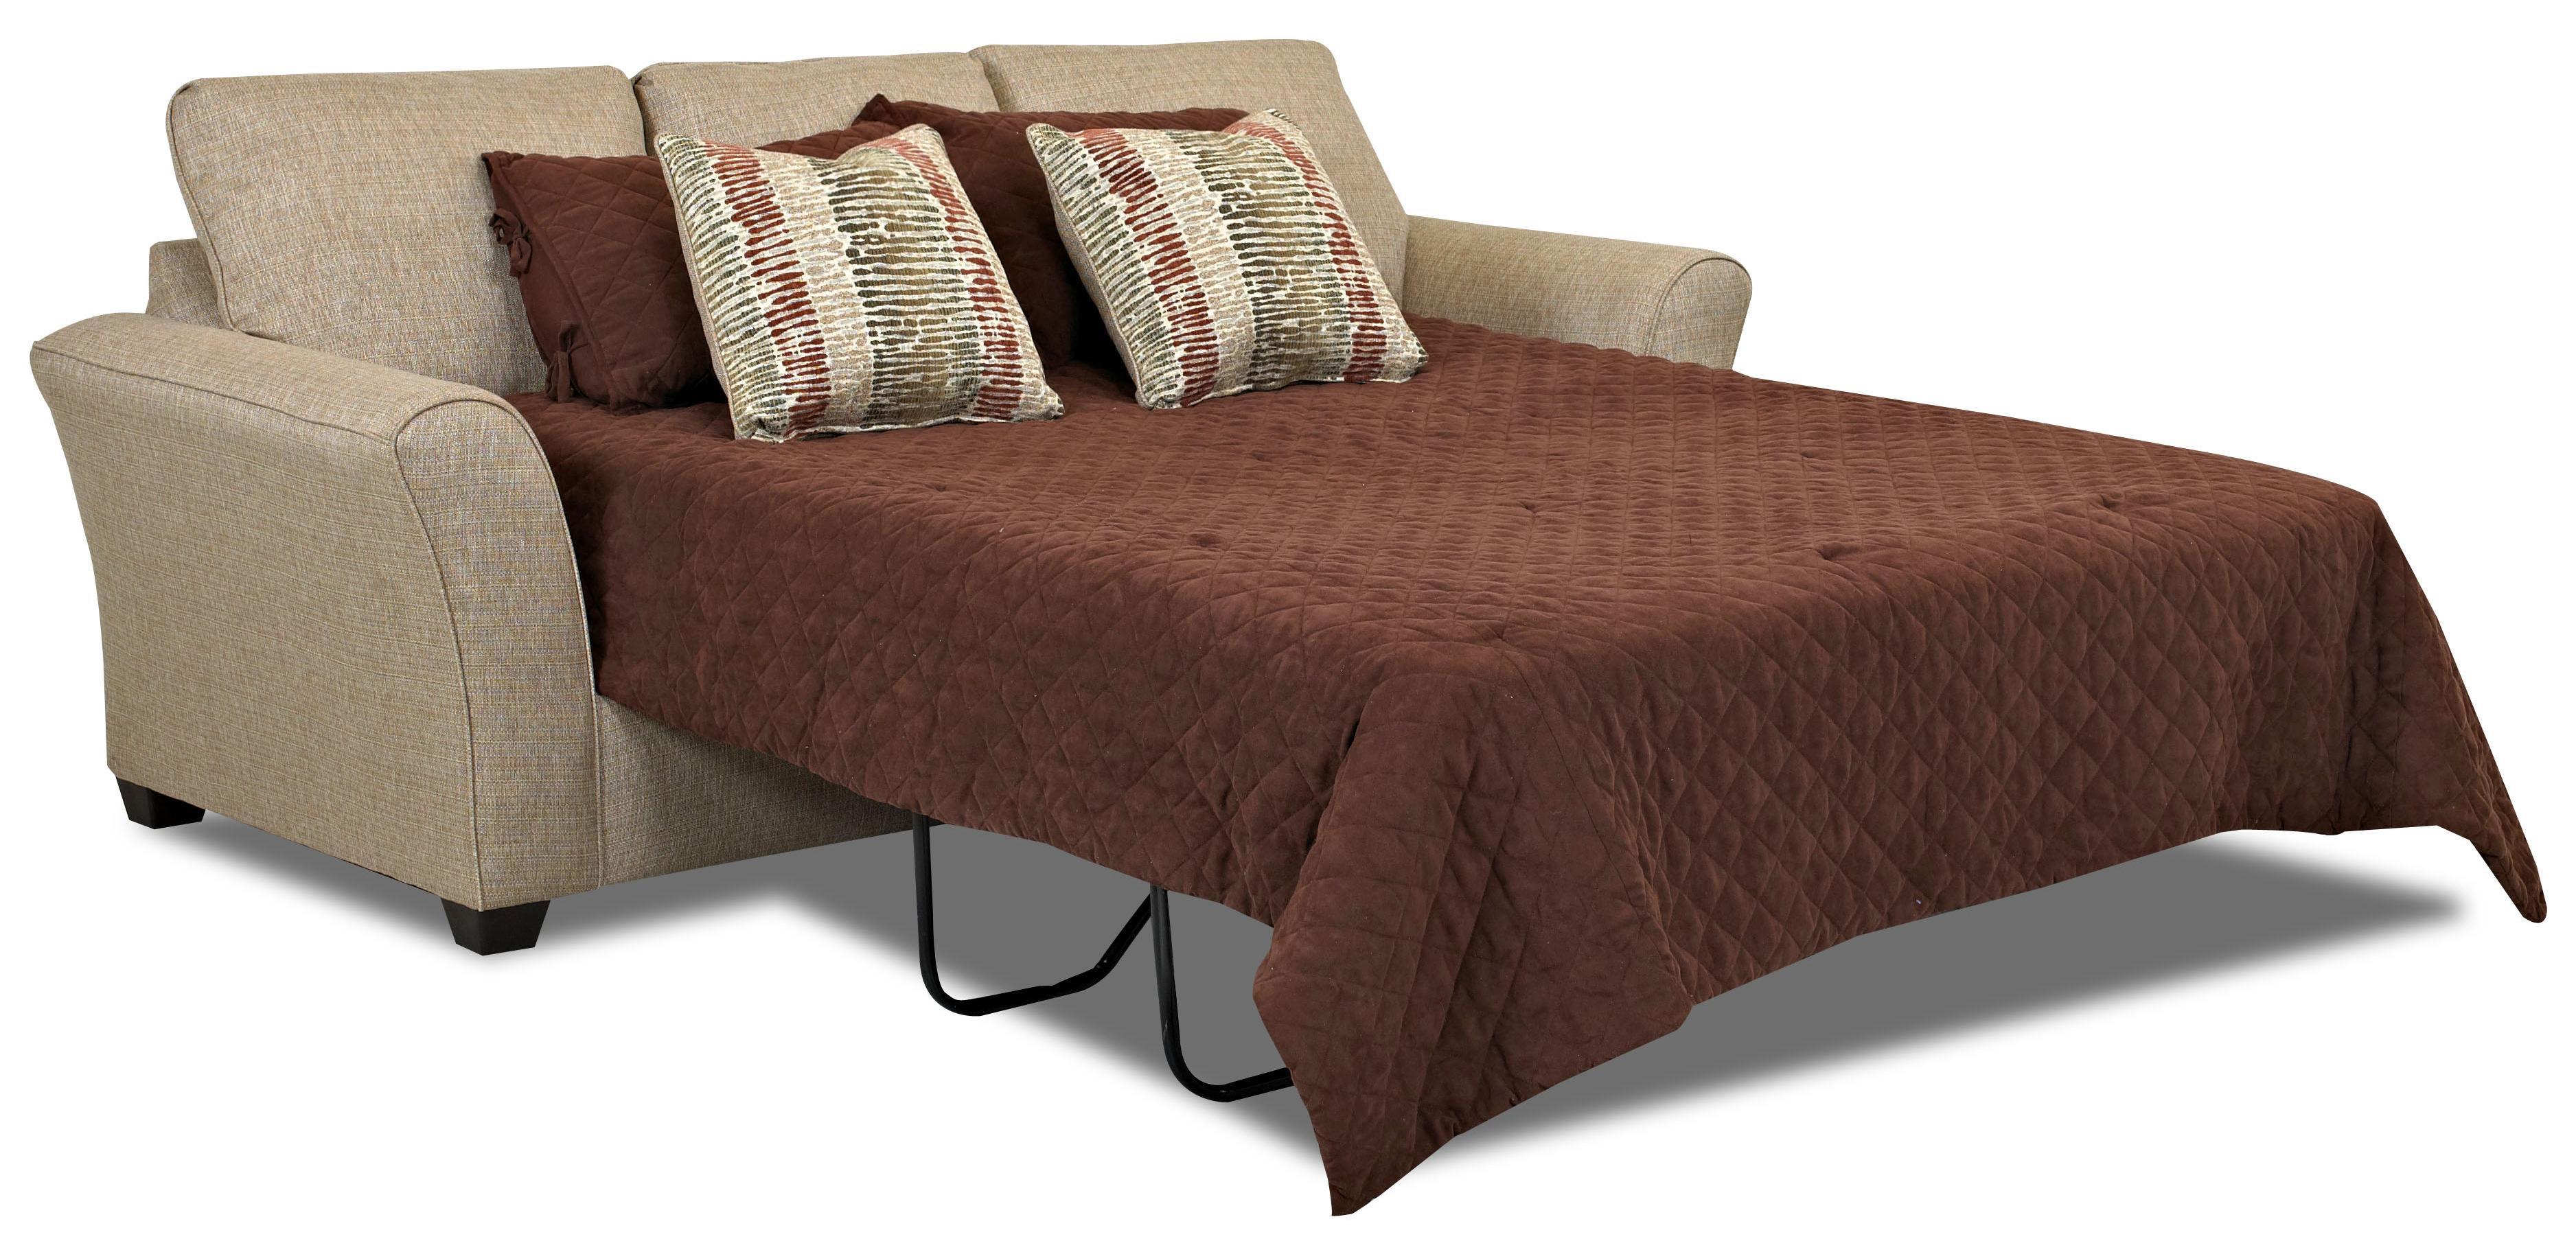 Transitional queen inner spring sleeper sofa by klaussner for Transitional sectional sofa sleeper